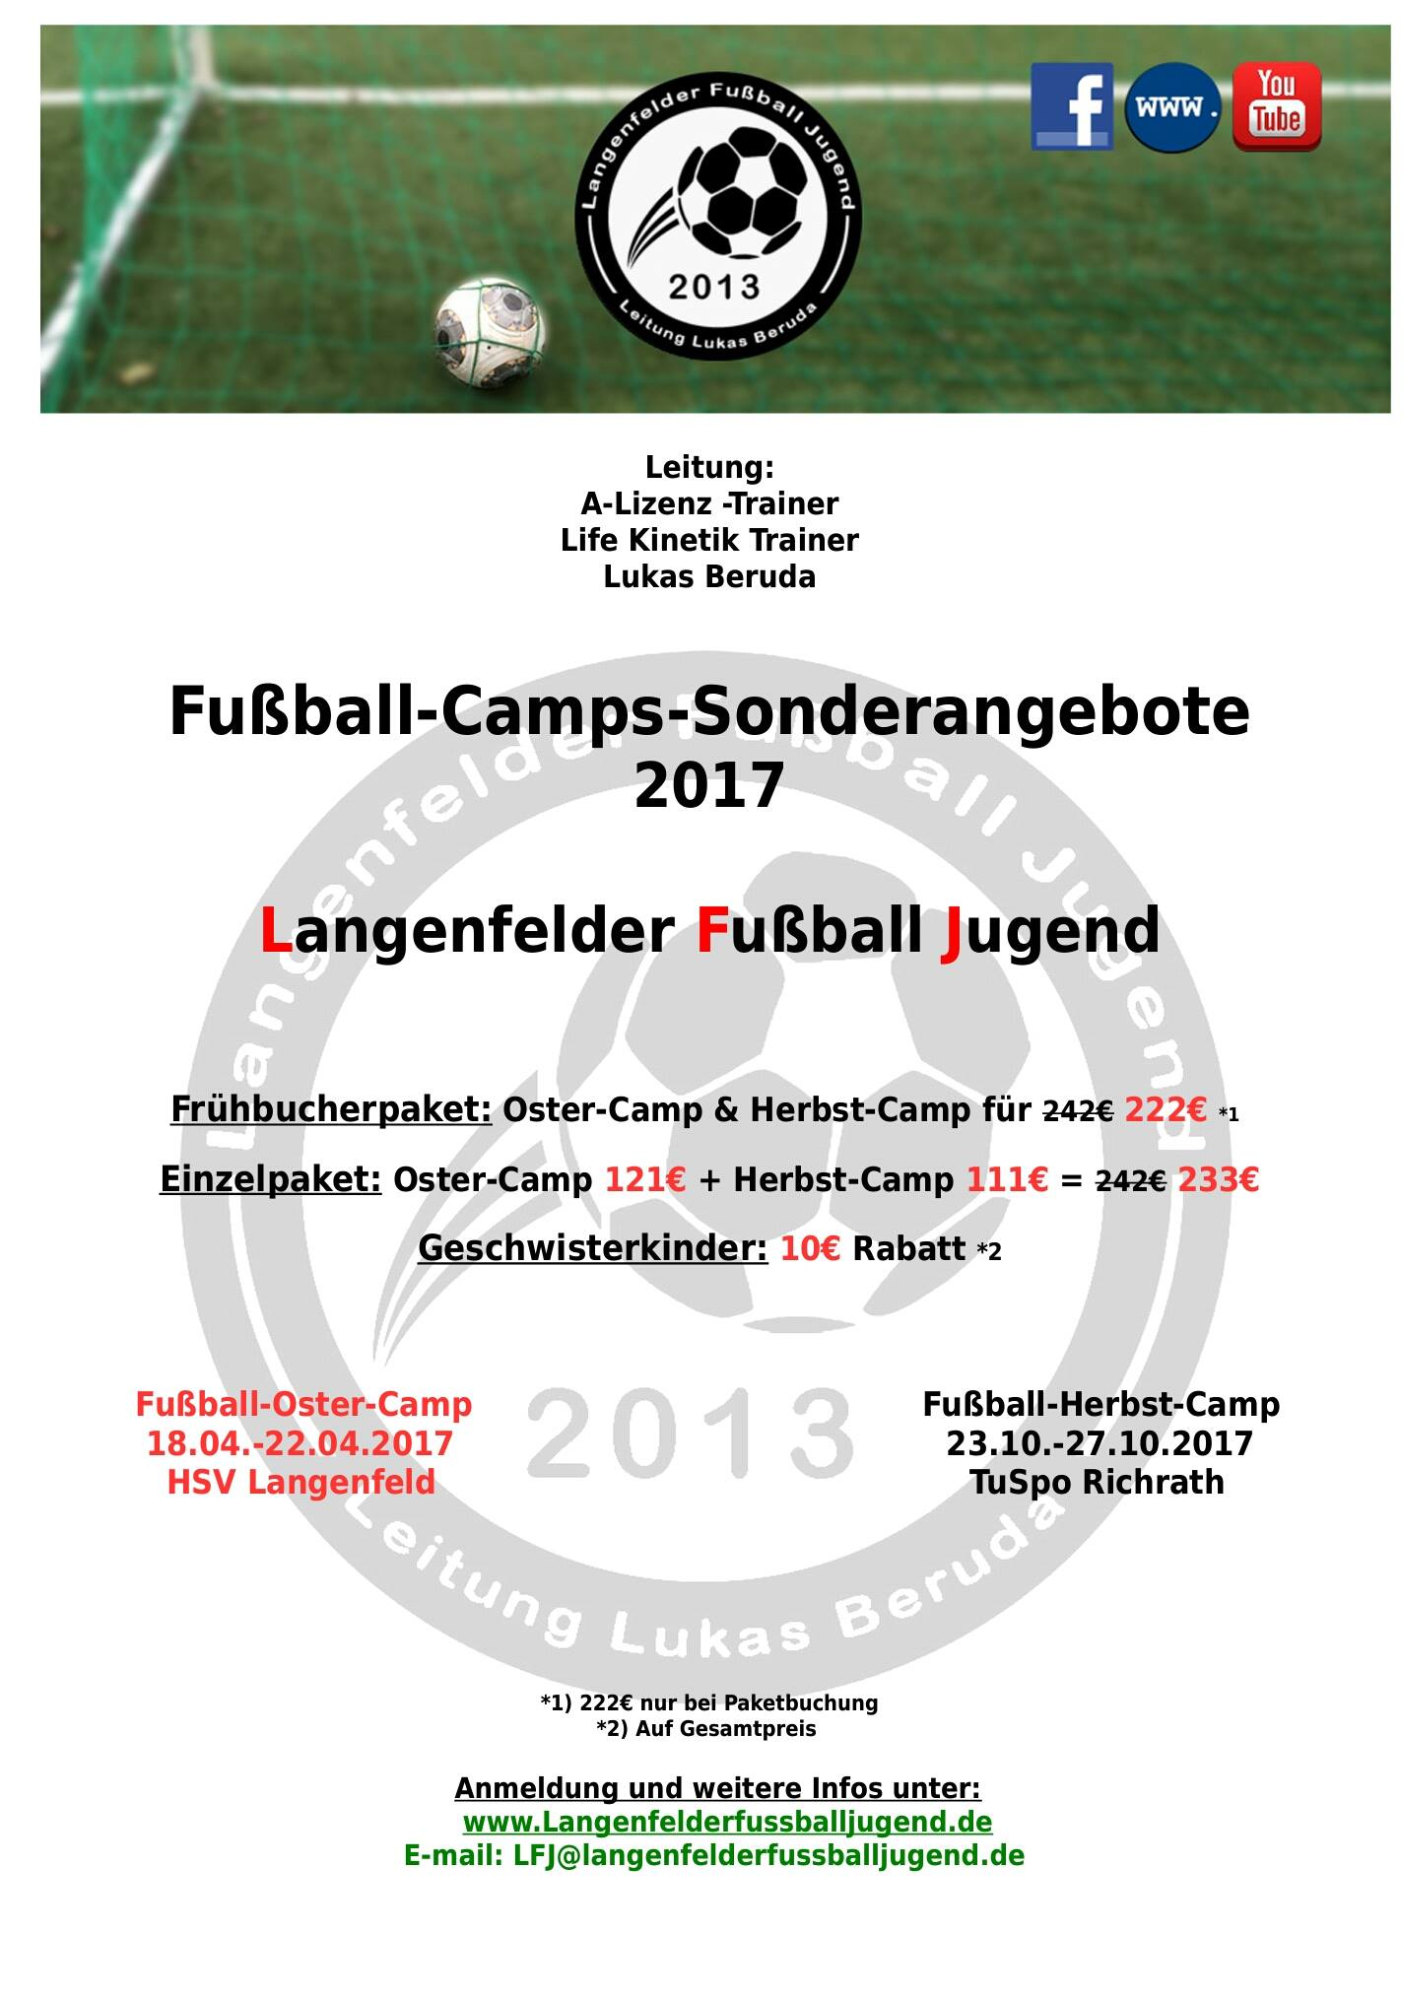 langenfelderfussballjugend - fußball-camps